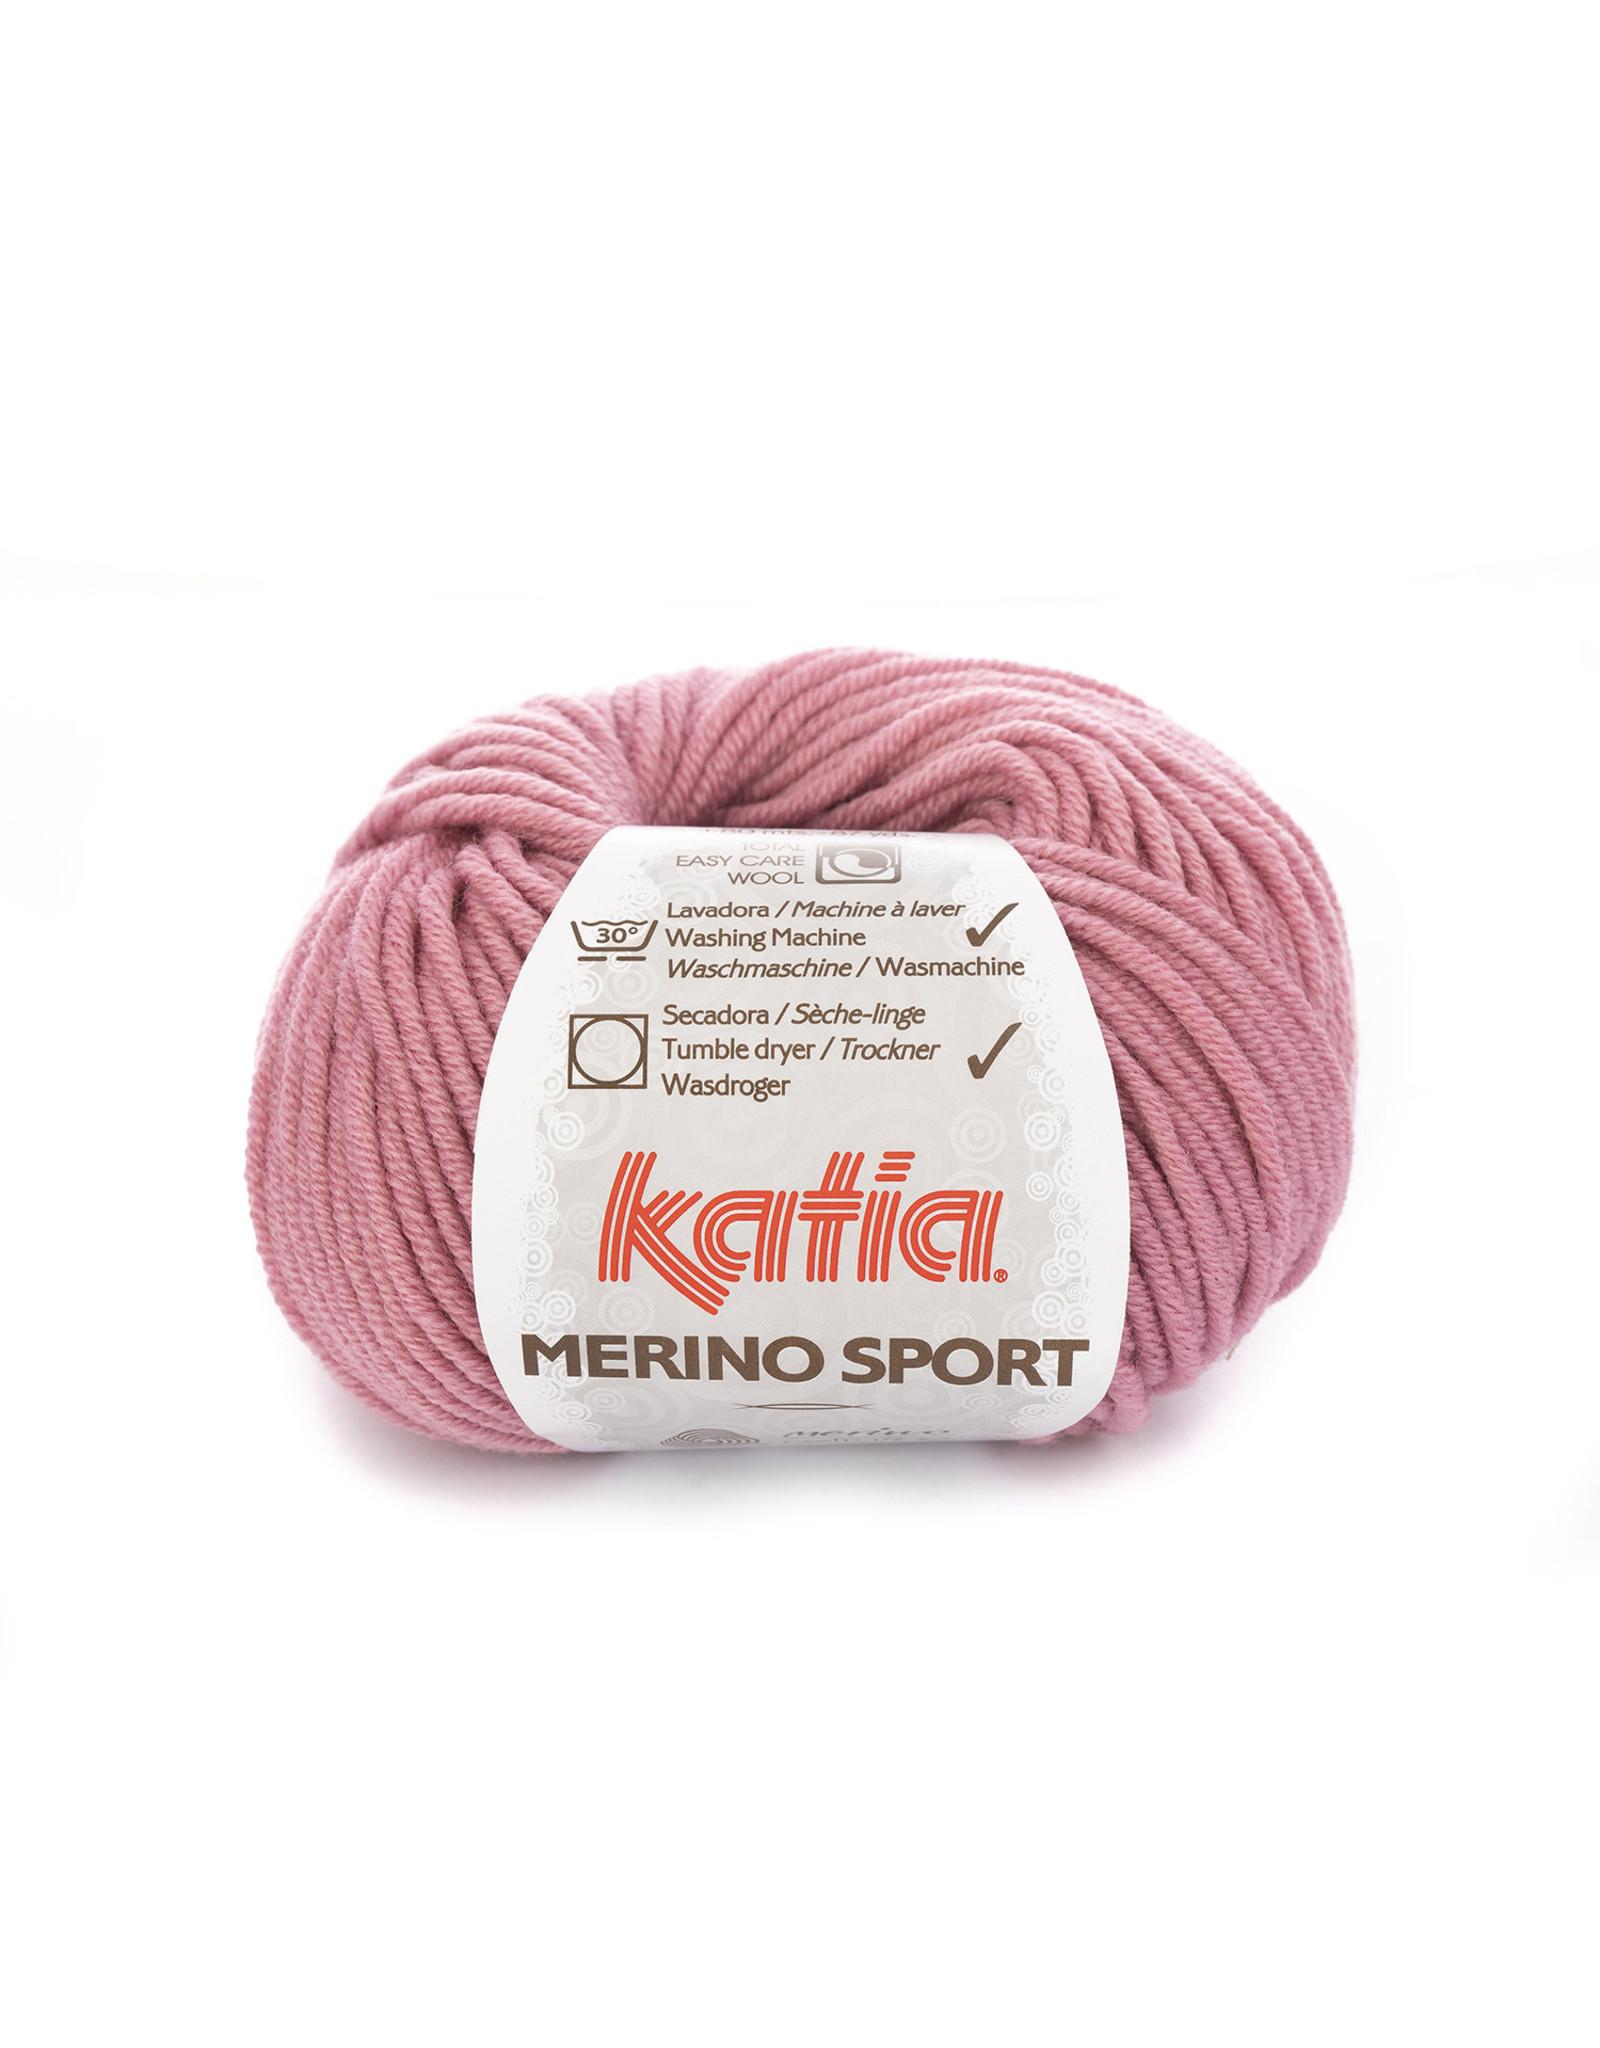 Katia Katia - Merino Sport - 28 Bleekrood - 50 gr.